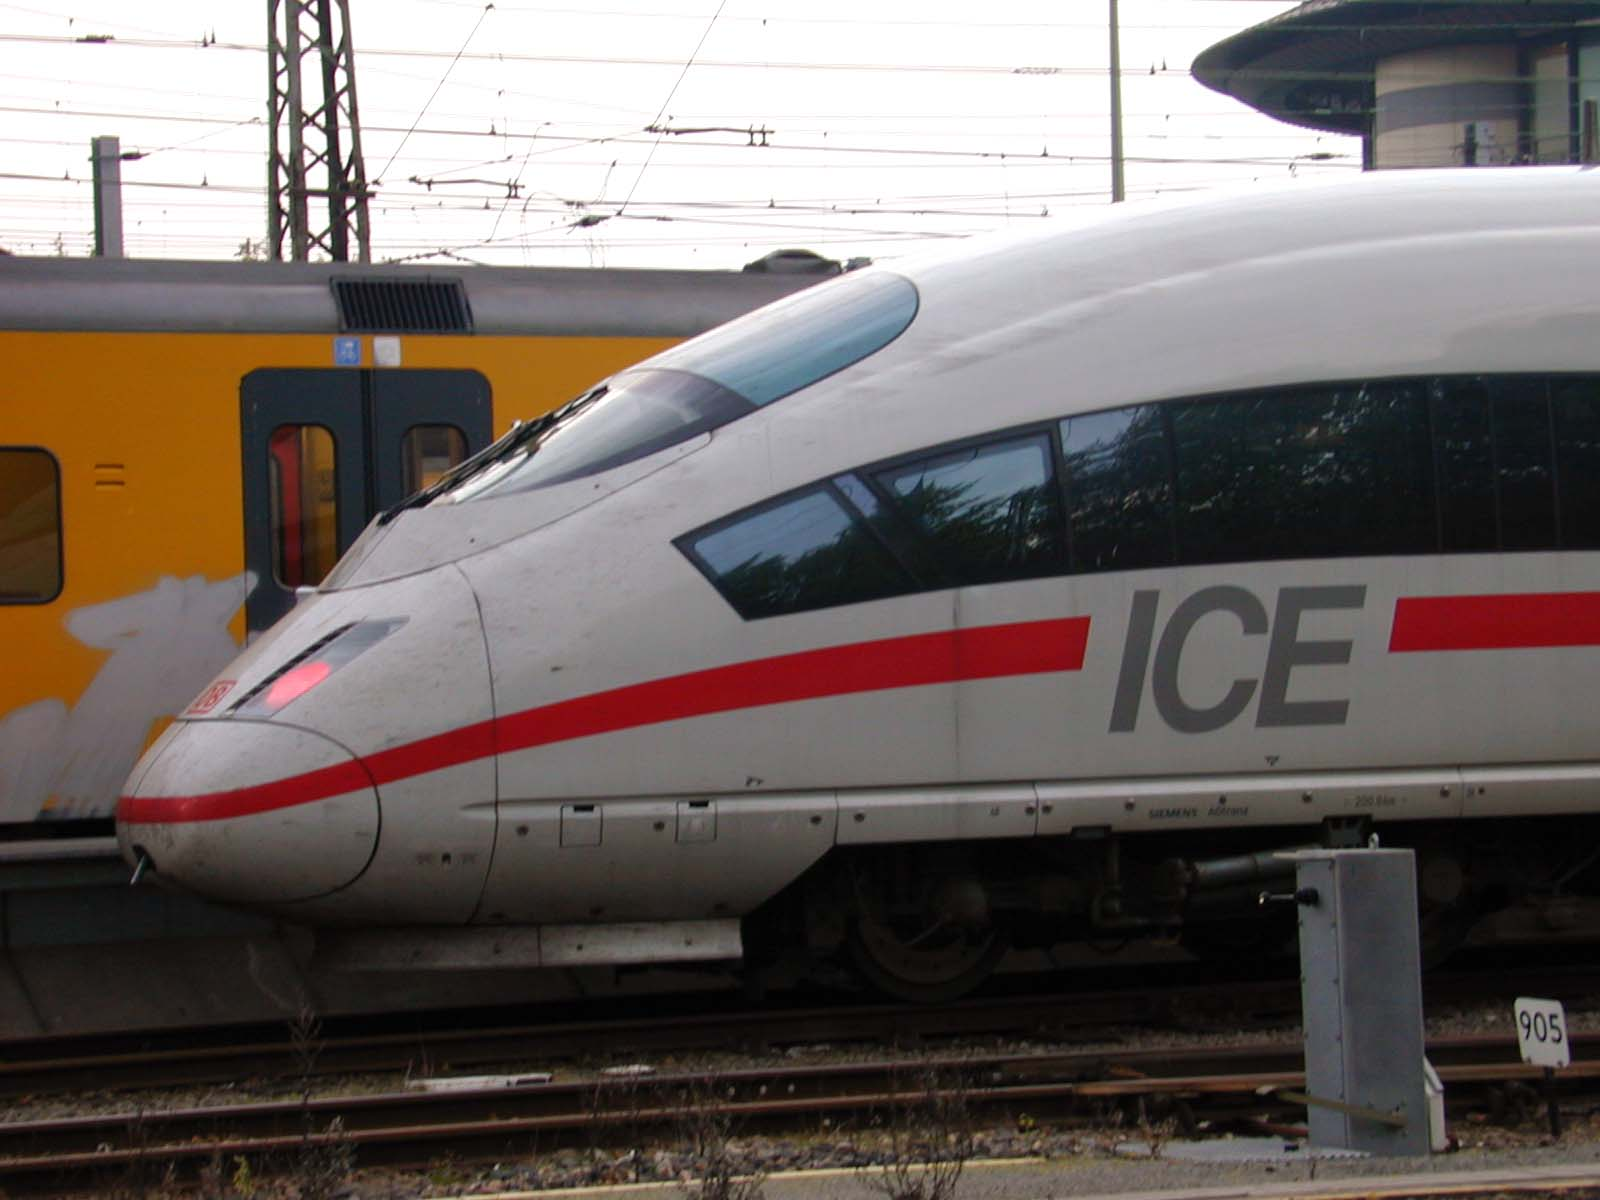 ice train railway white speed train high